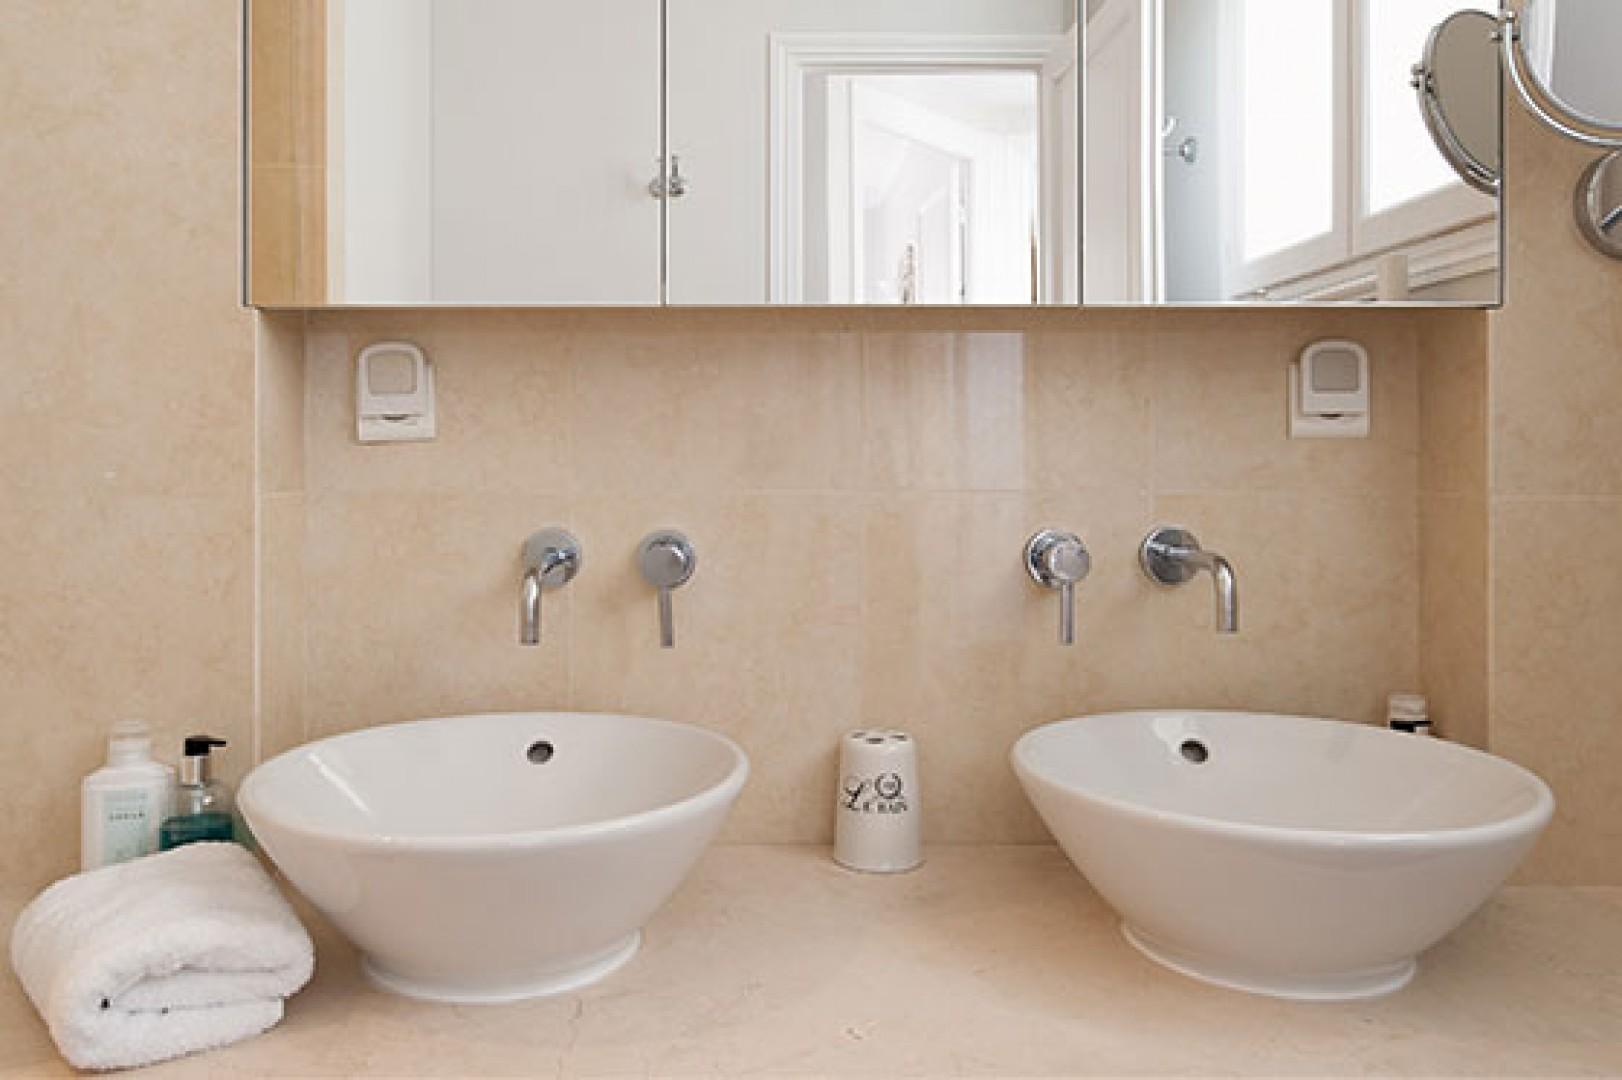 Enjoy double sinks and plenty of storage space in bathroom 2.